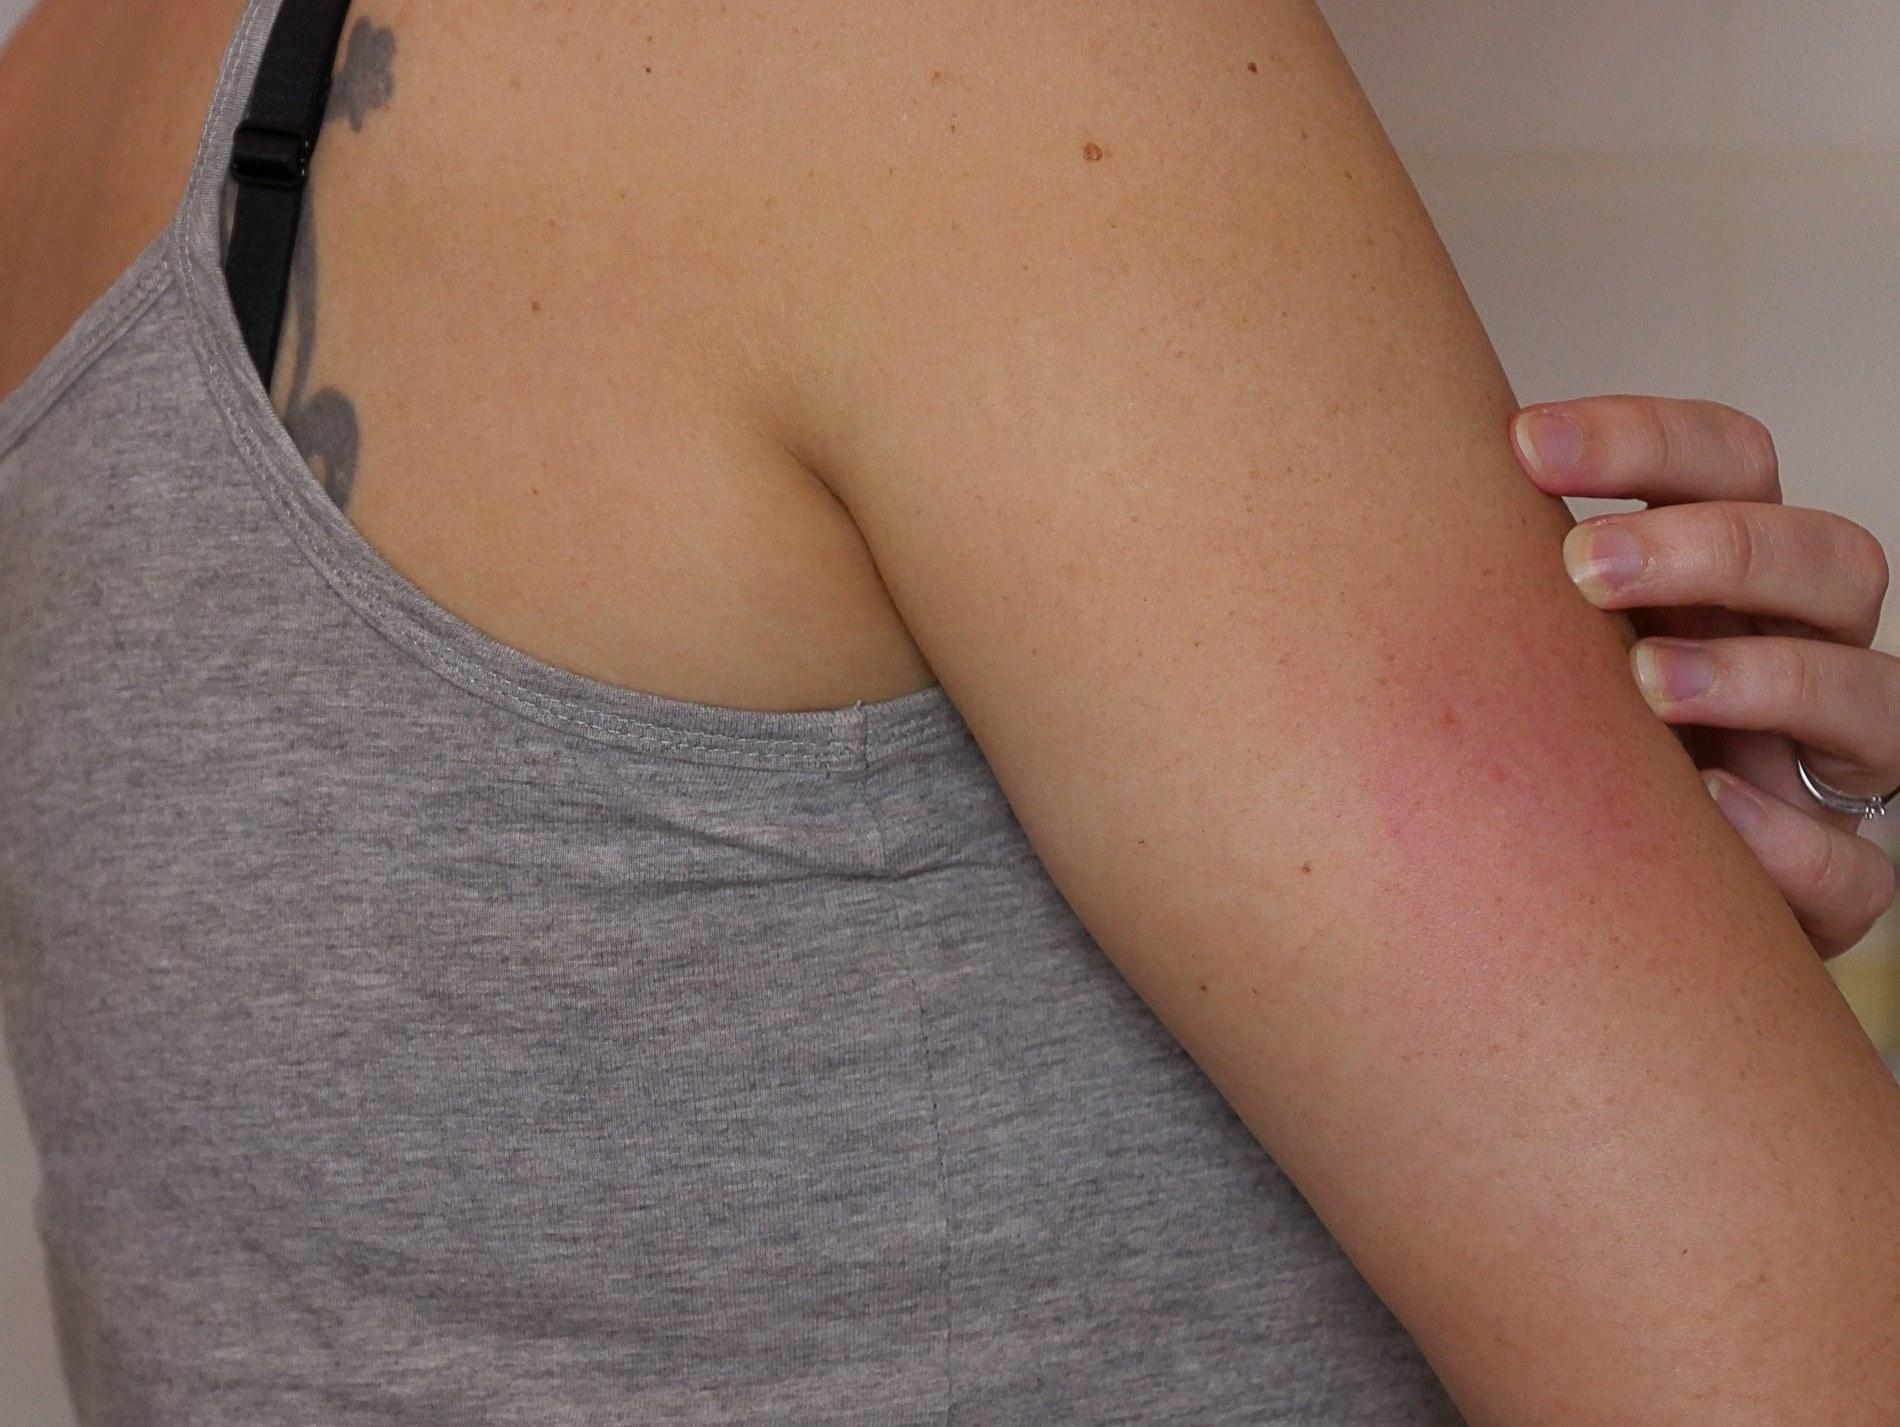 peau déshydratée et rougeur - juliesliberties